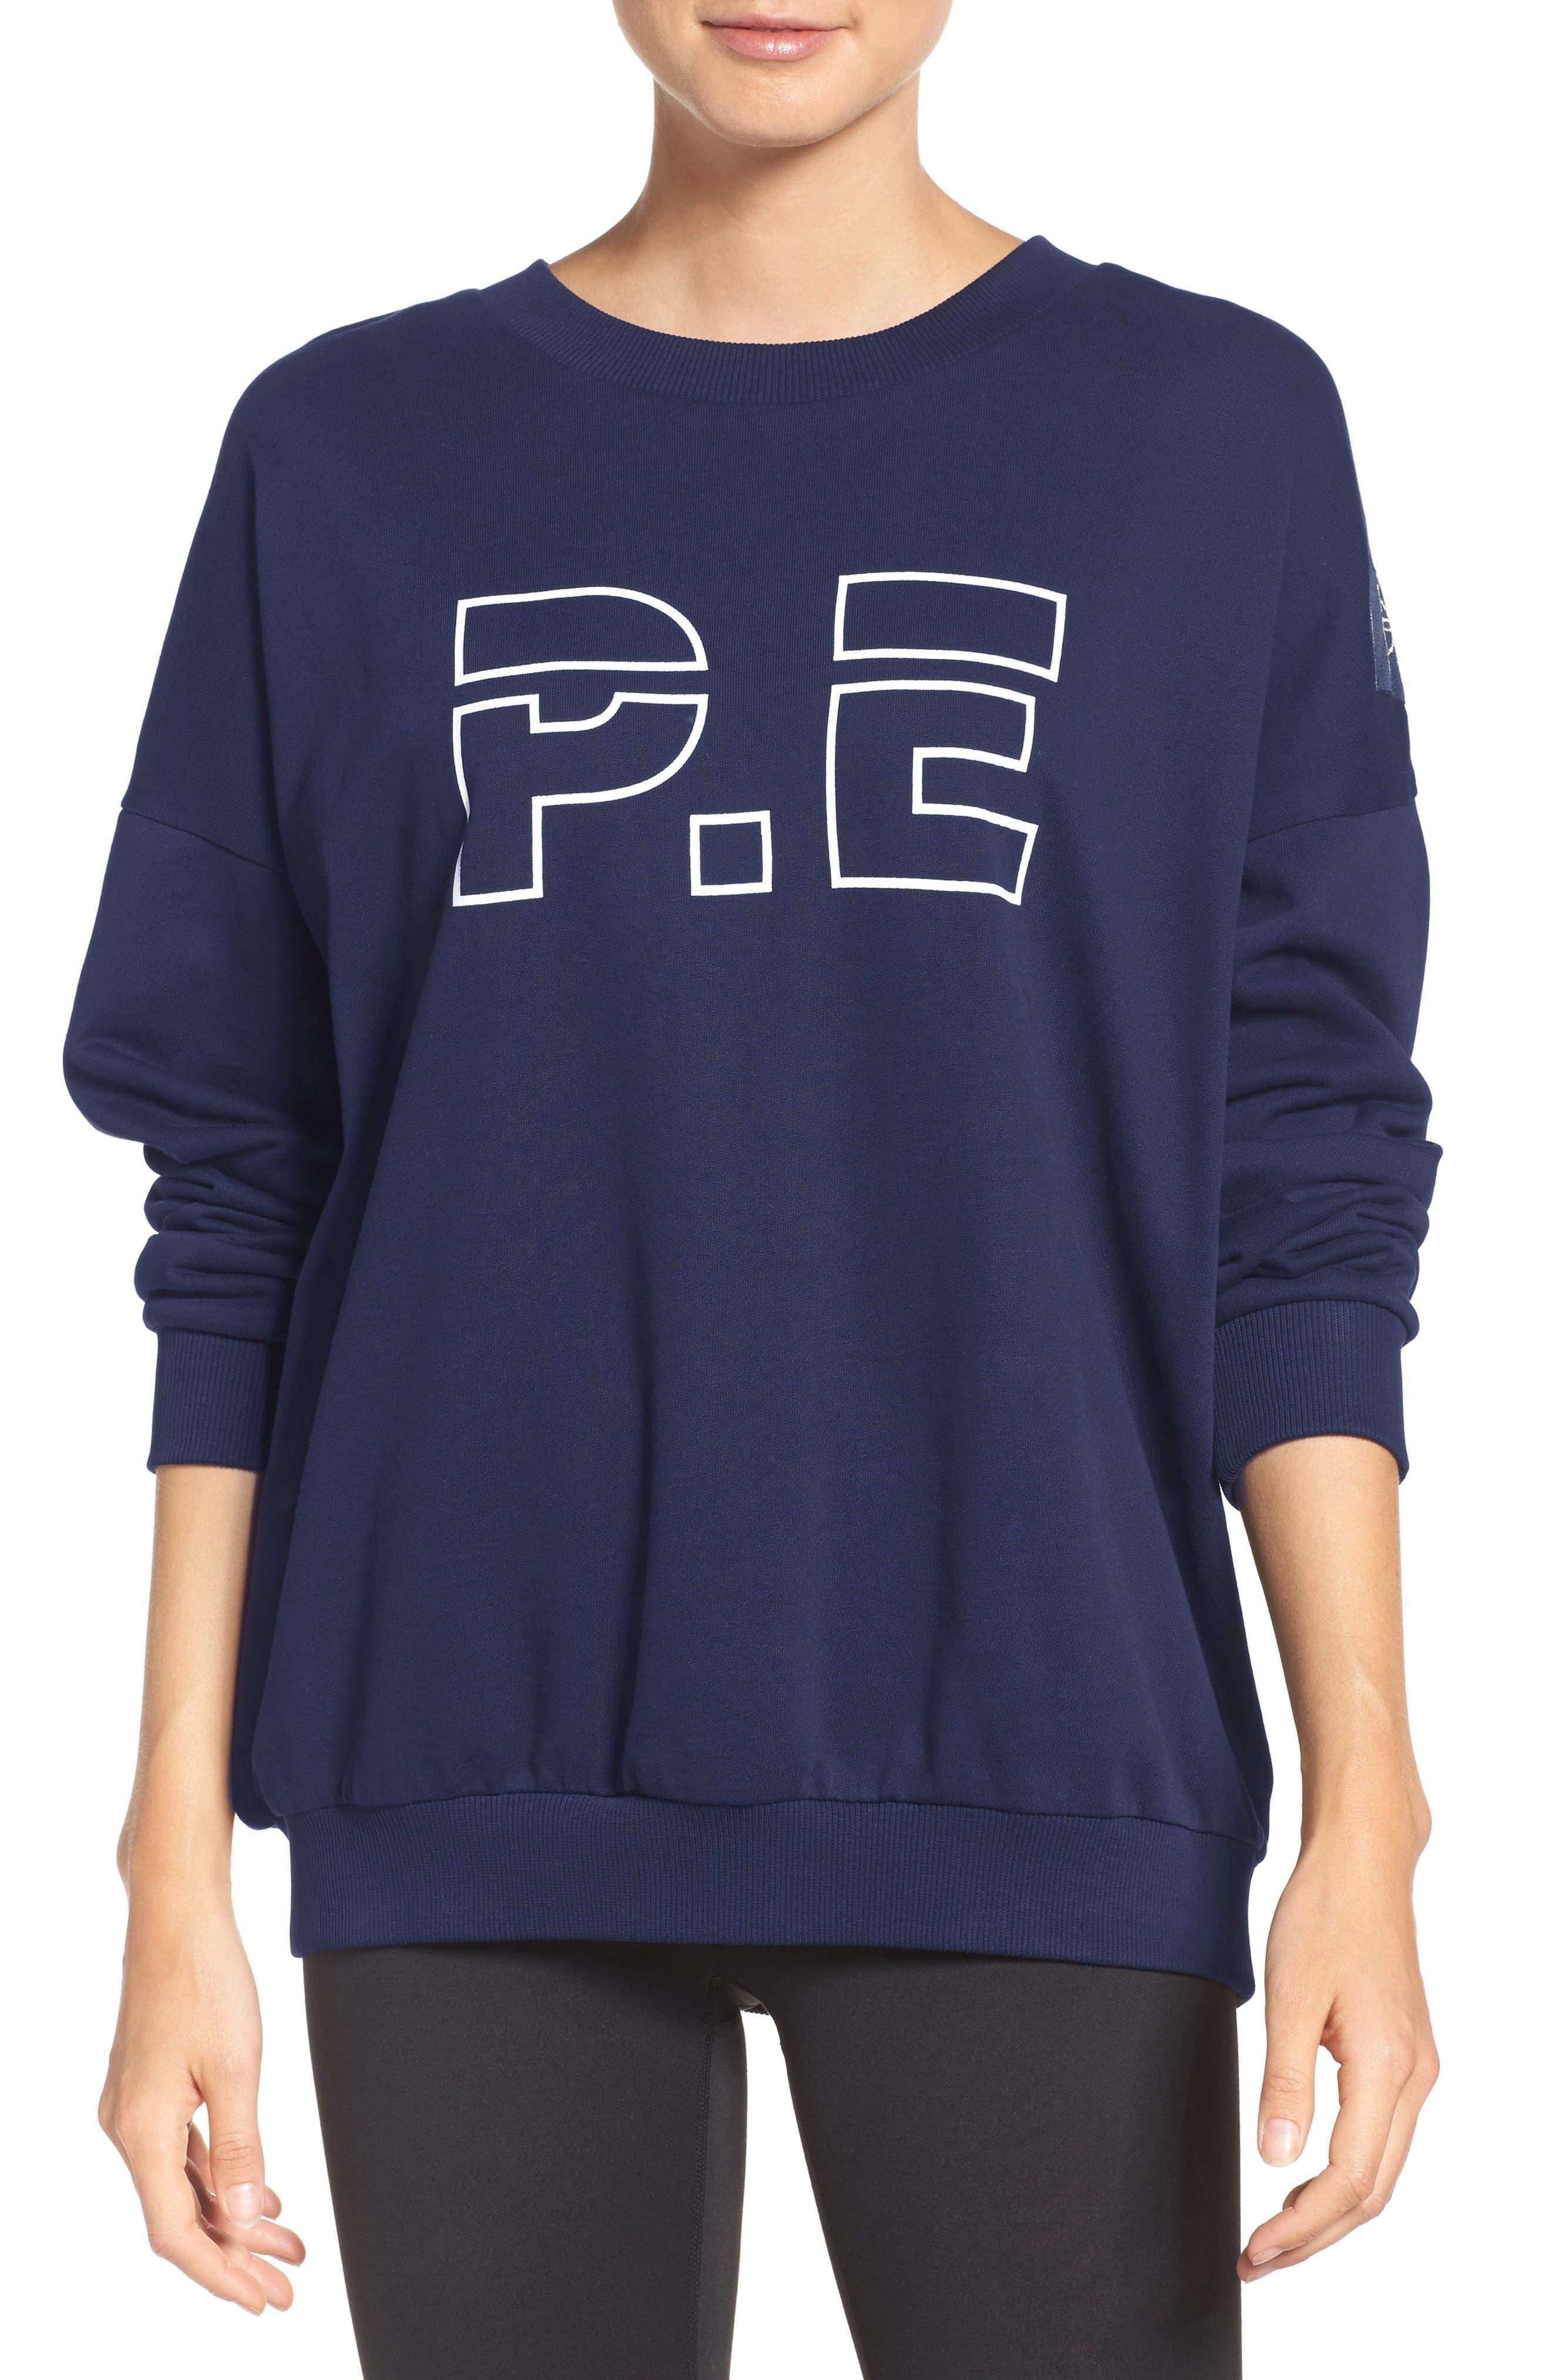 Main Image - P.E. Nation The Heads Up Sweatshirt